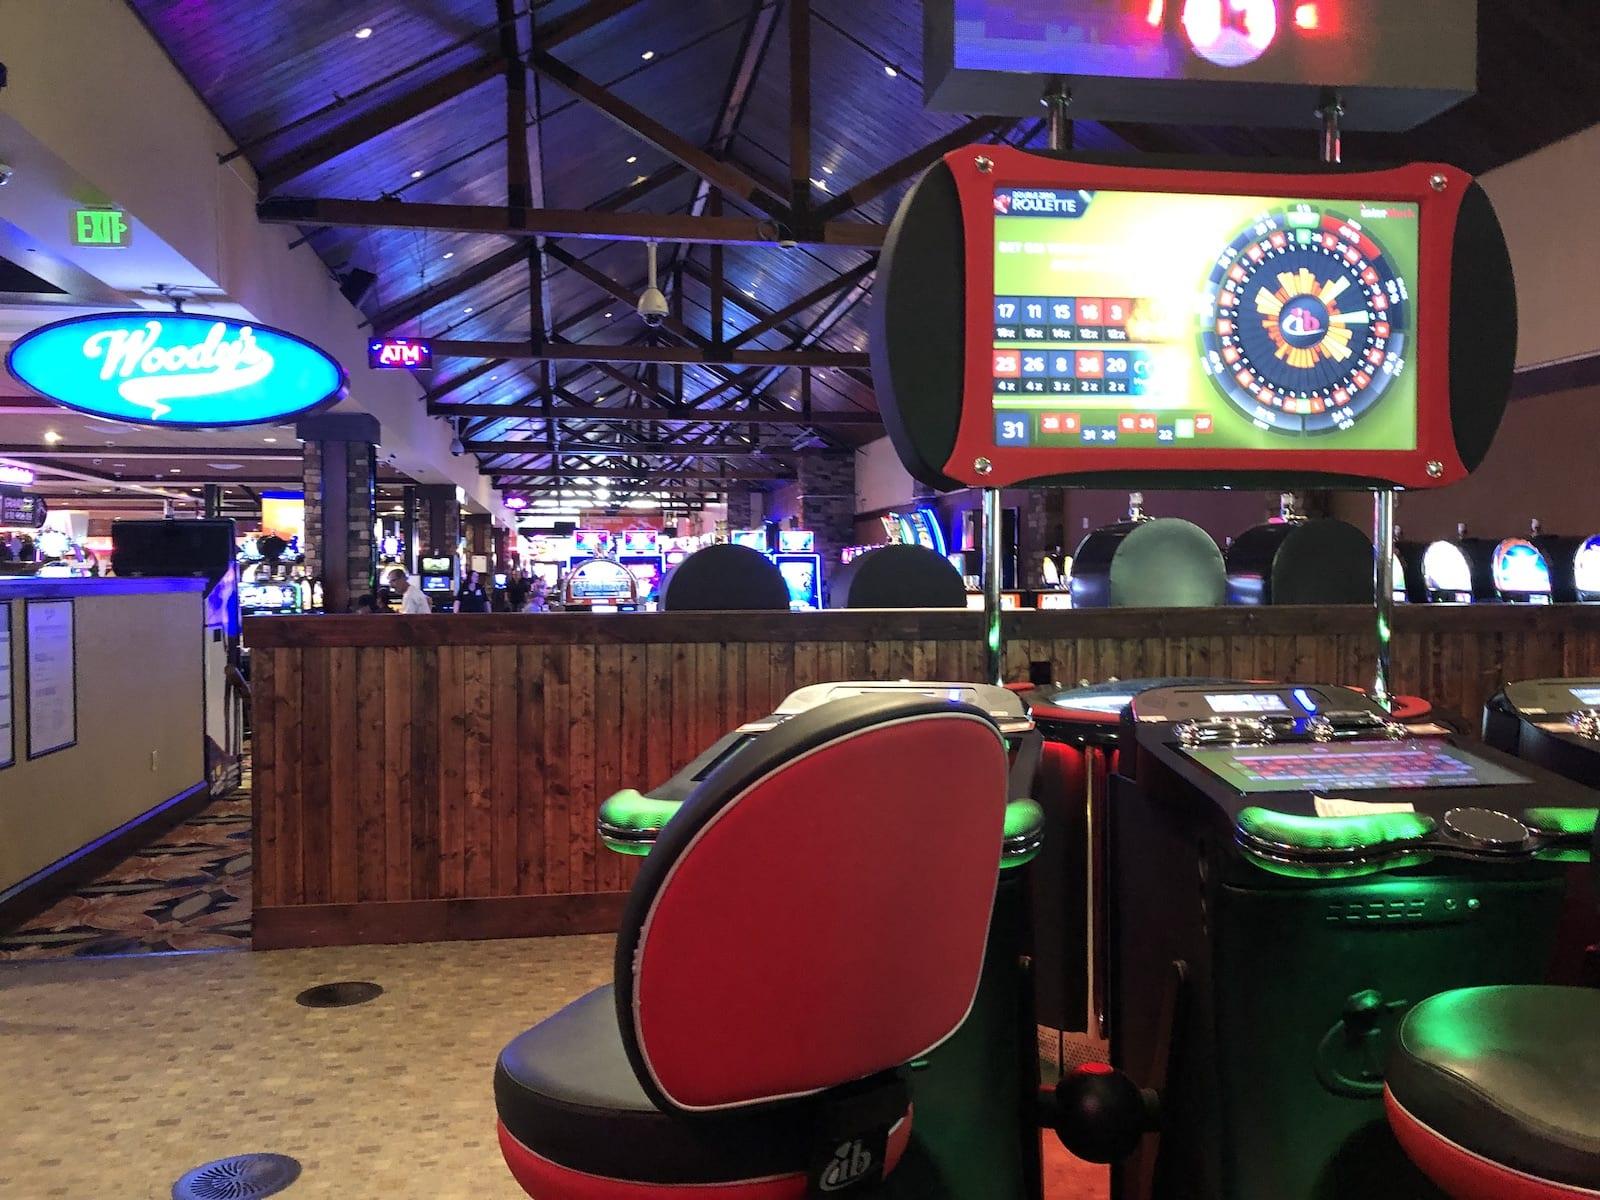 Wildwood Casino Cripple Creek CO Electronic Roulette